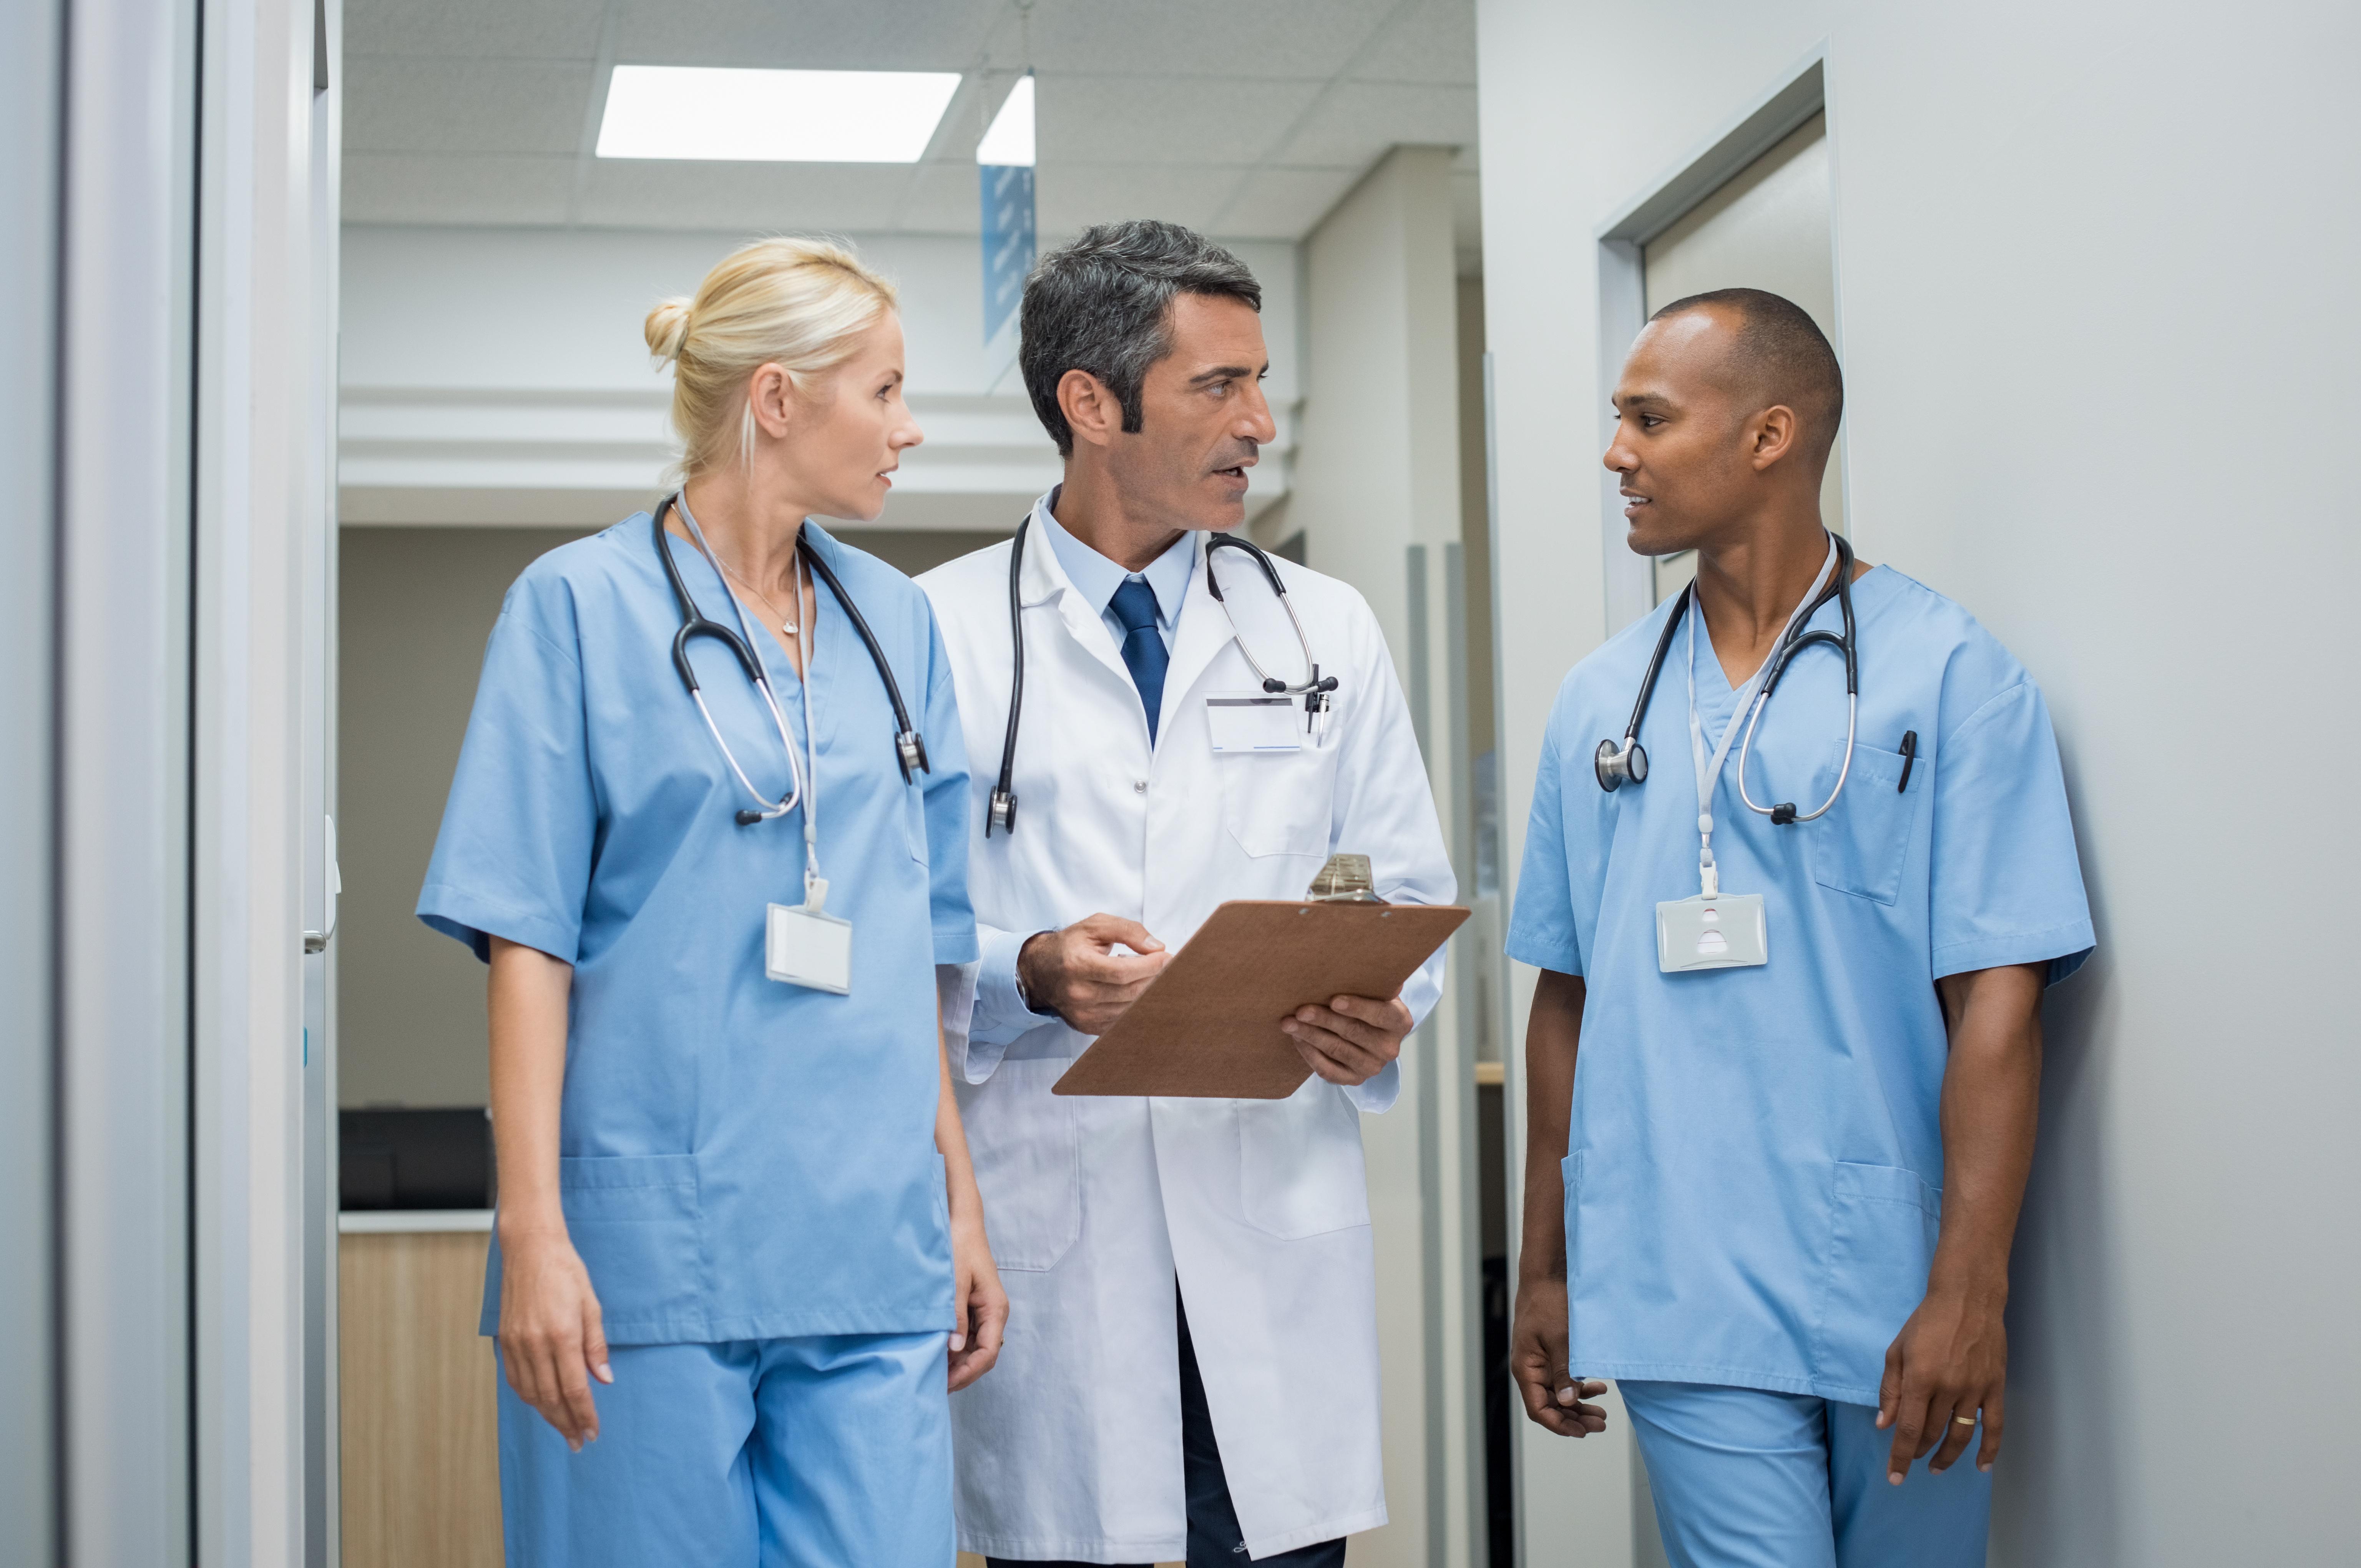 doctor-and-medical-staff-P7LDPSA.jpg